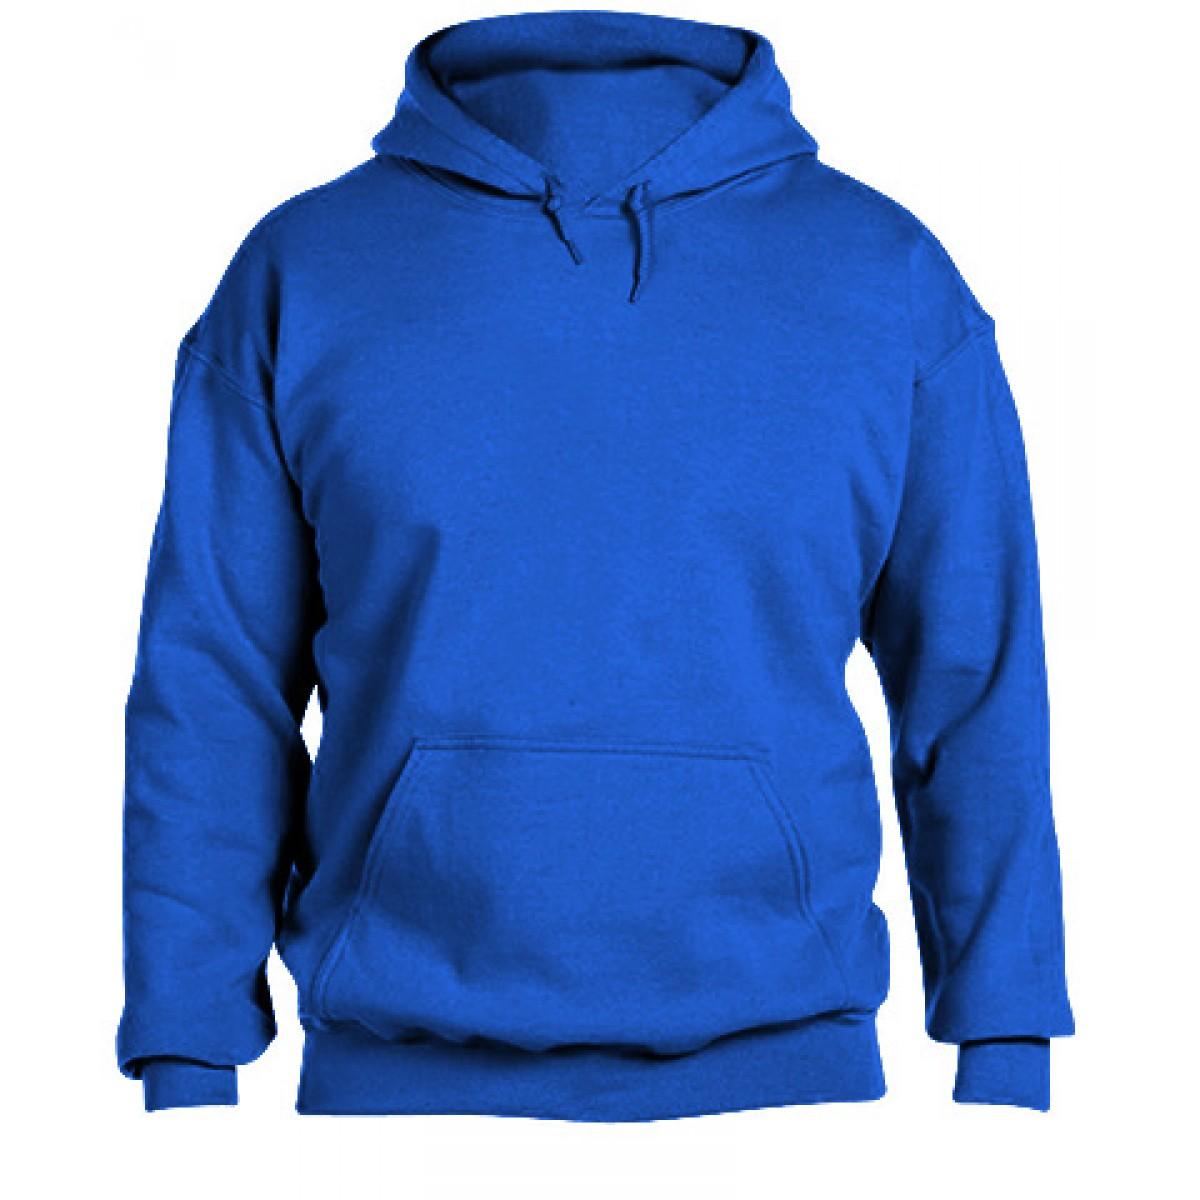 Hooded Sweatshirt  50/50 Heavy Blend-Royal Blue-M